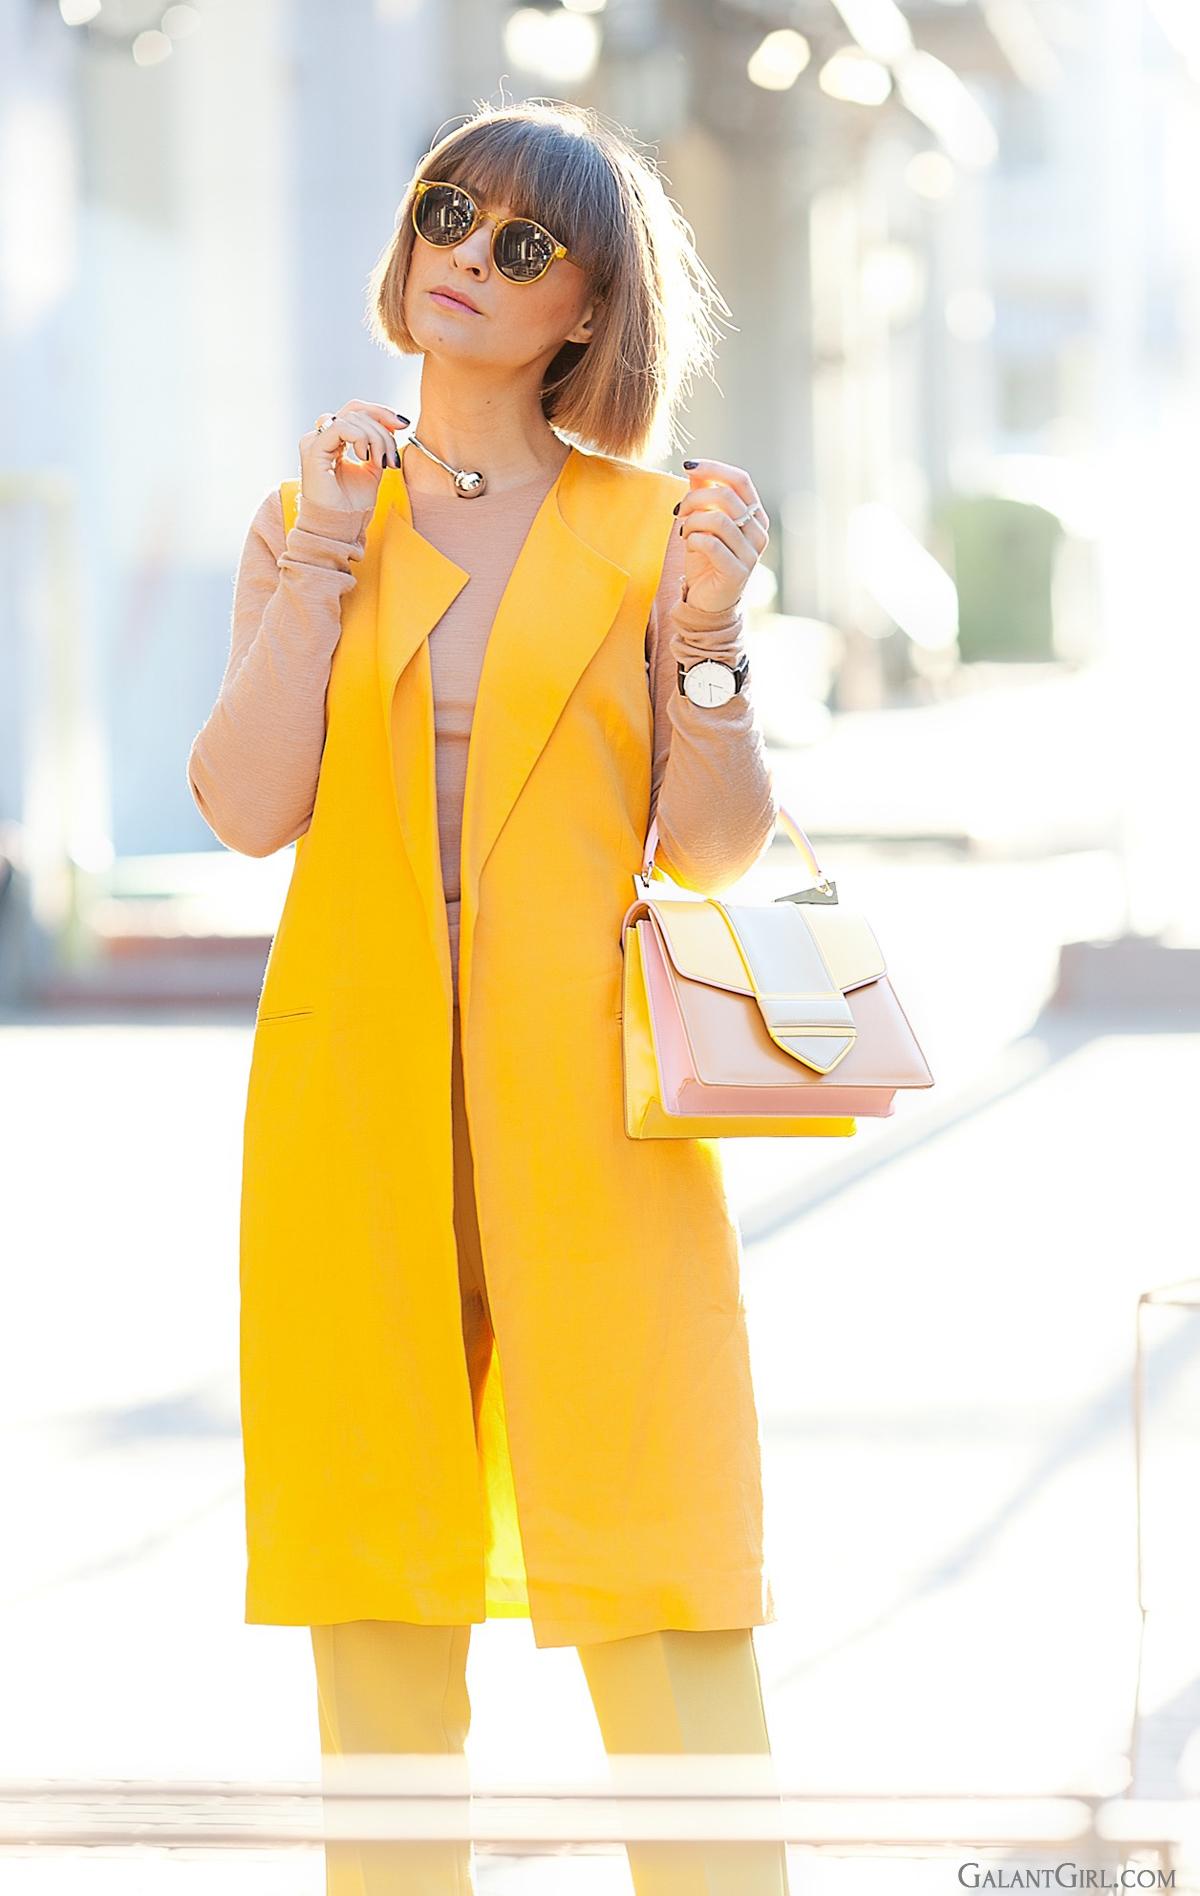 zara orange vest and sara battaglia bag, spring outfit, fashion trends 2015, galant girl